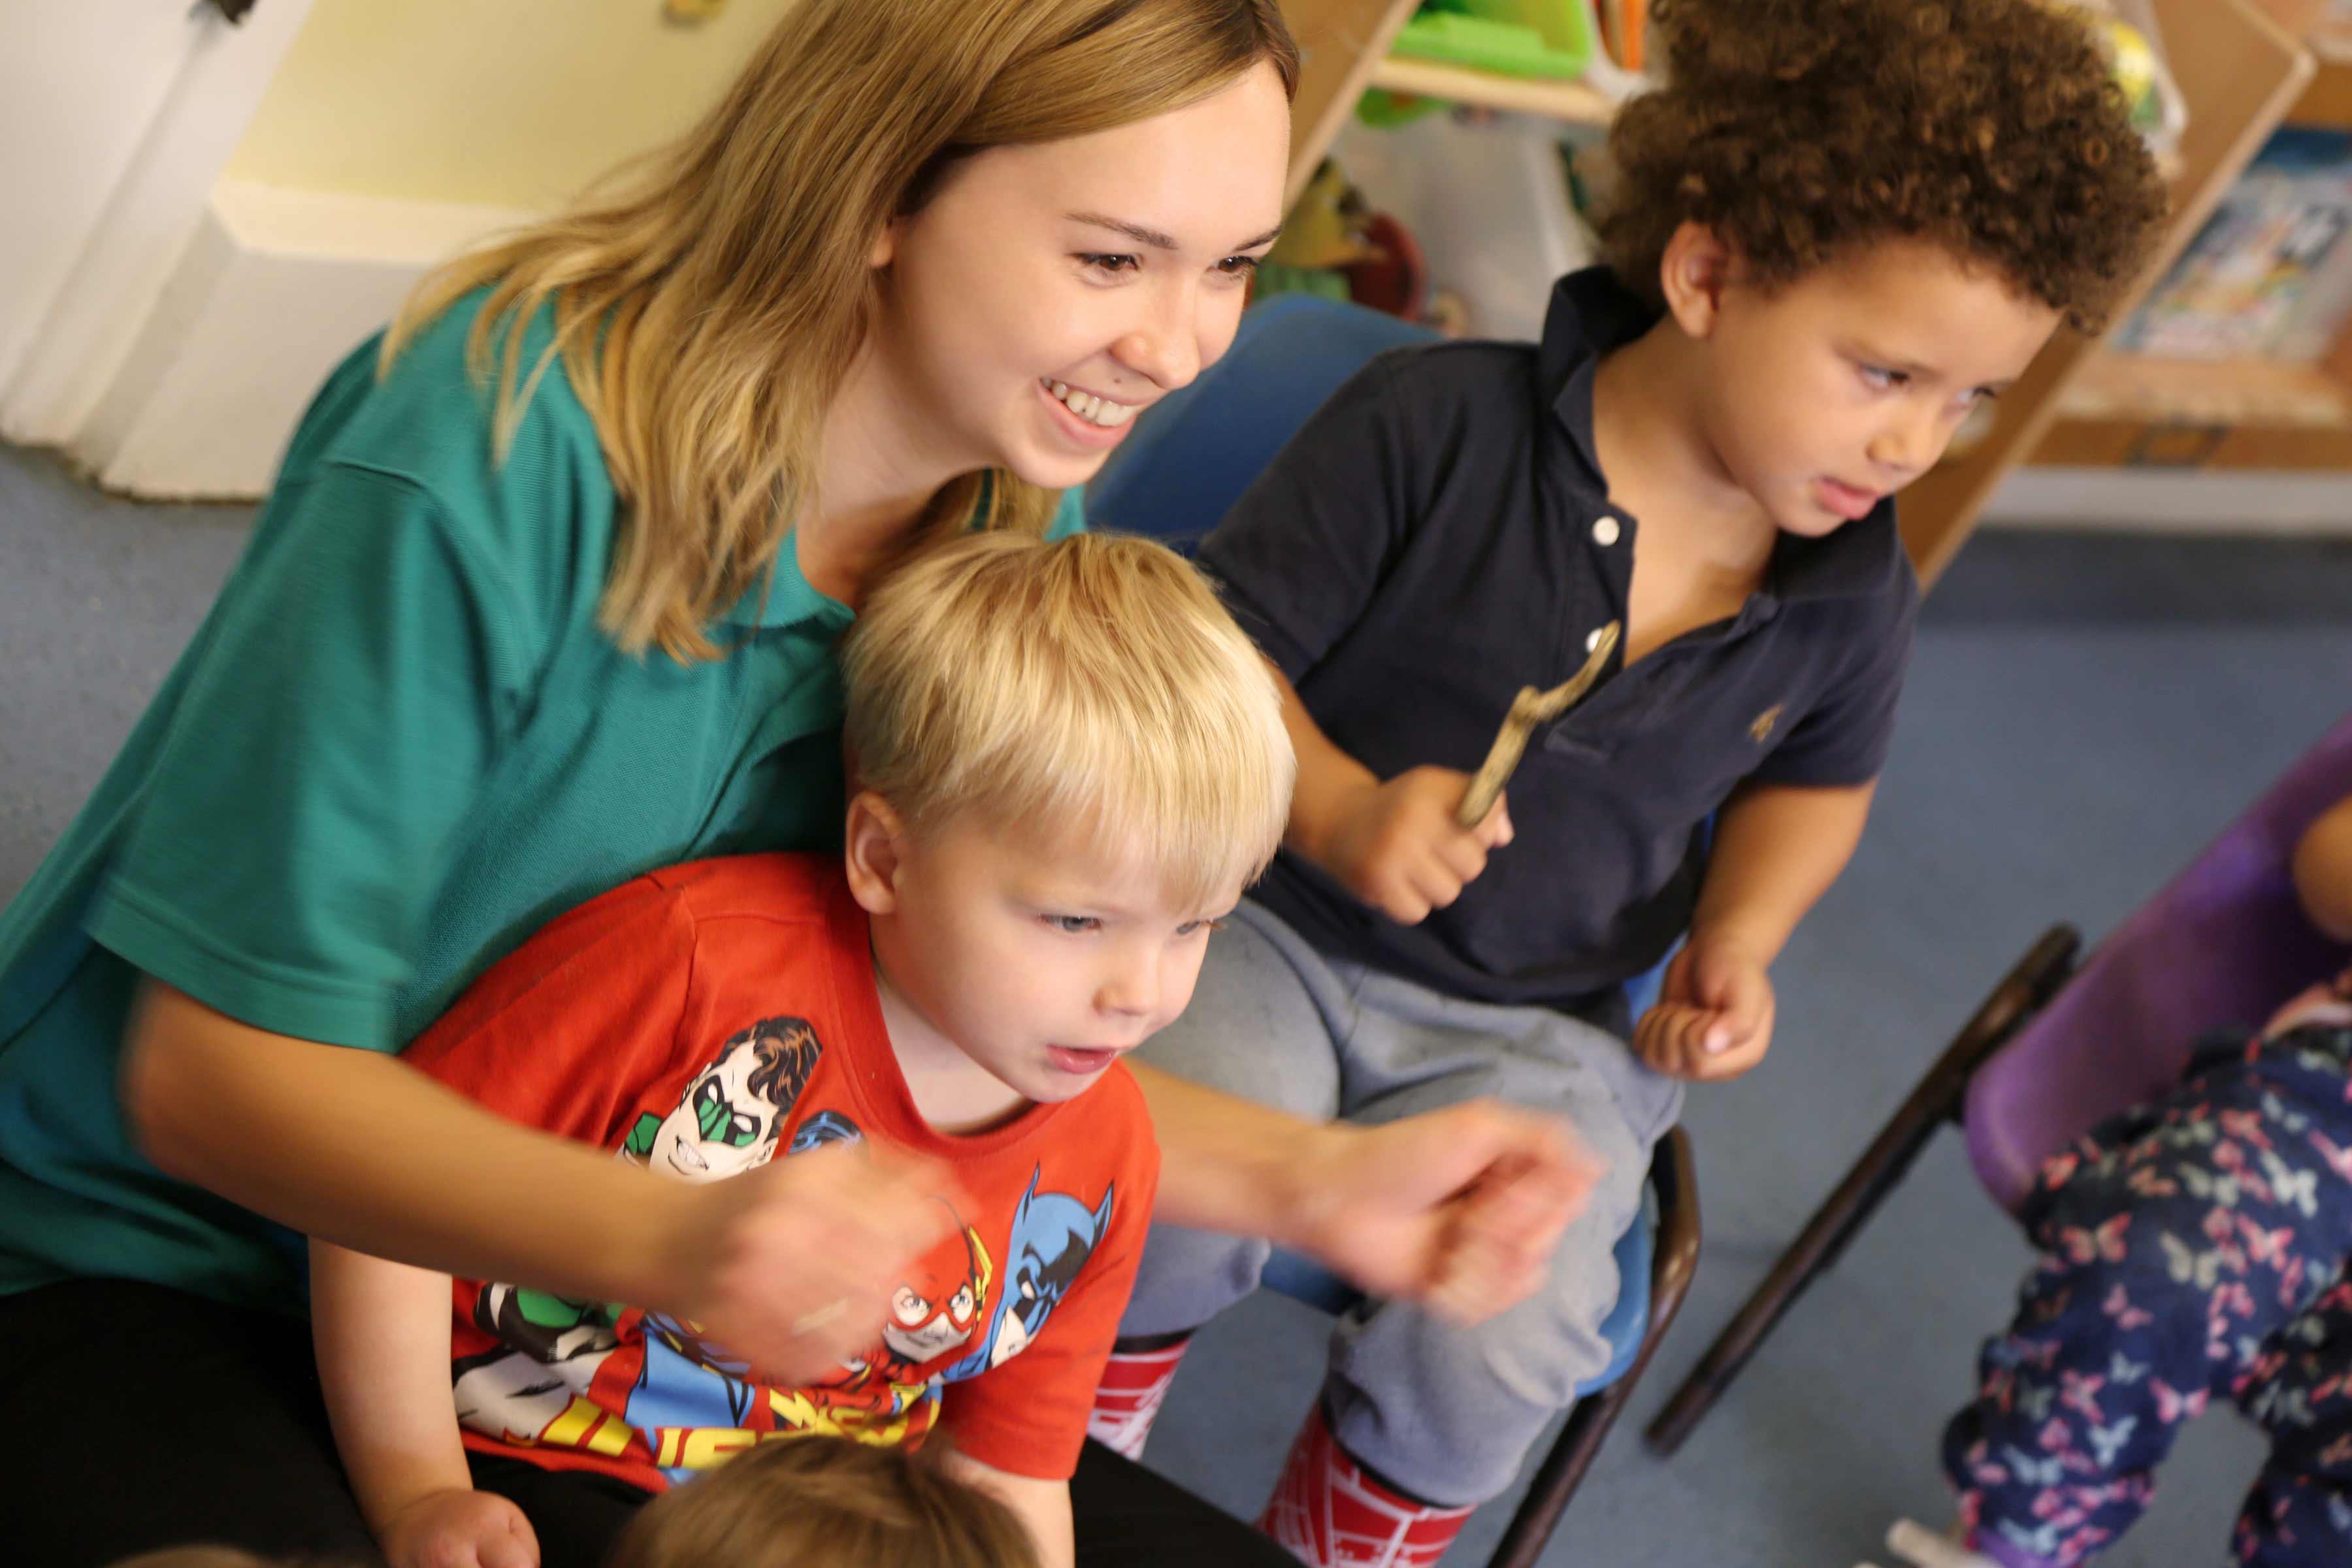 Teacher cuddling young boy playing a game